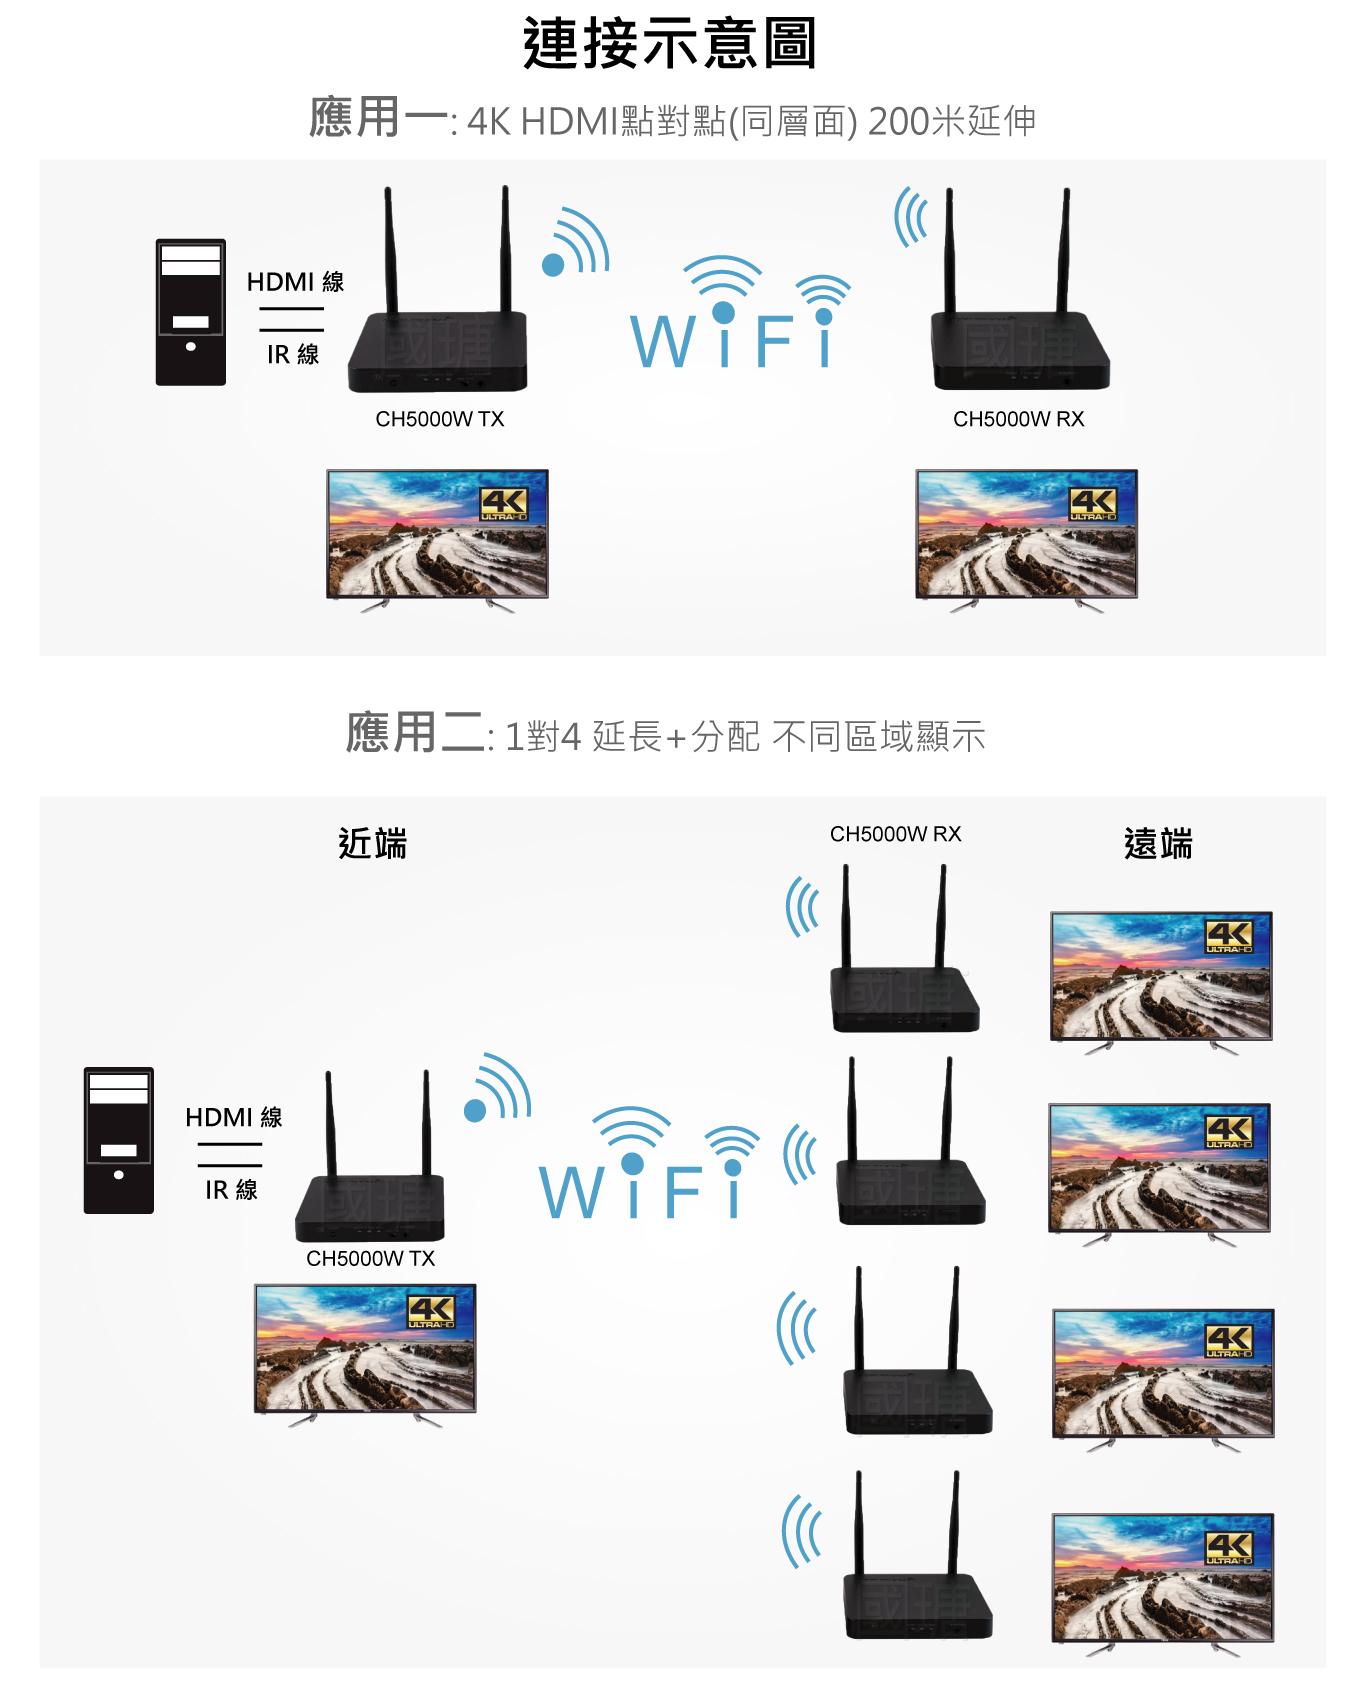 4K HDMI+IR訊號無線延伸器,1進多出